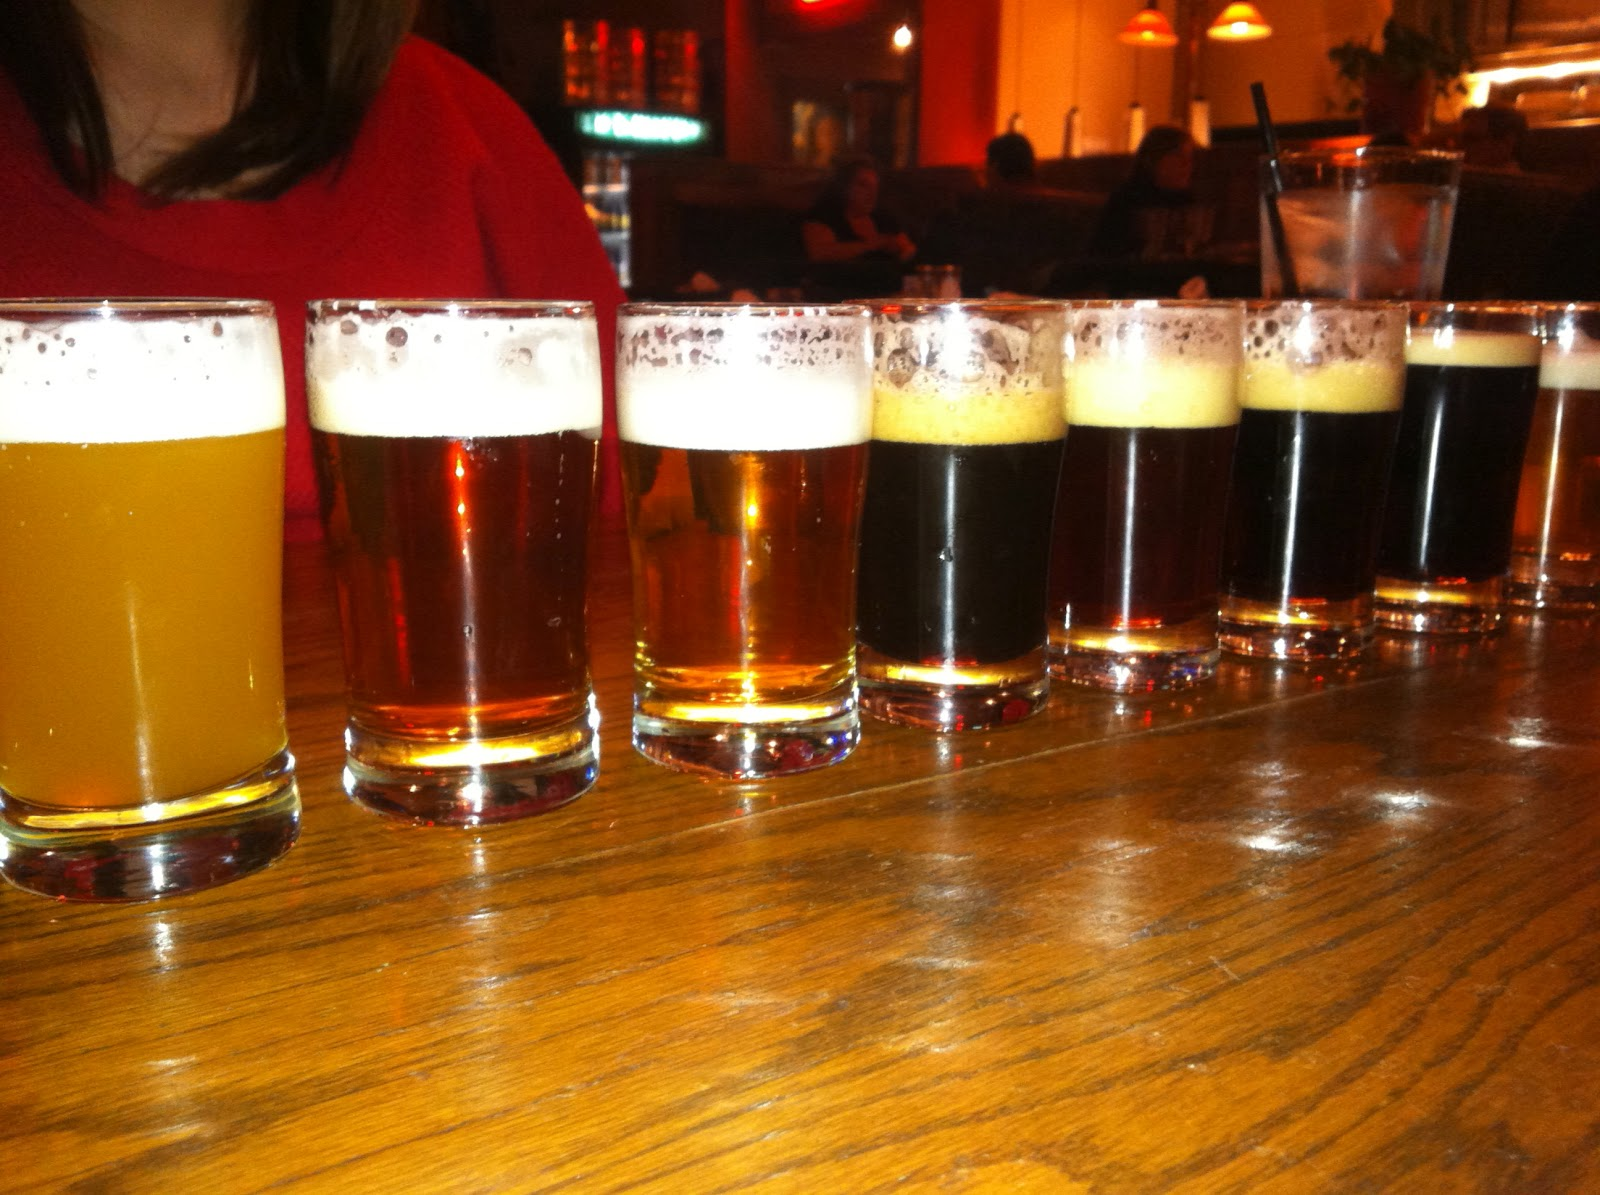 Pittsburgh Menu Rock Bottom Restaurant & Brewery